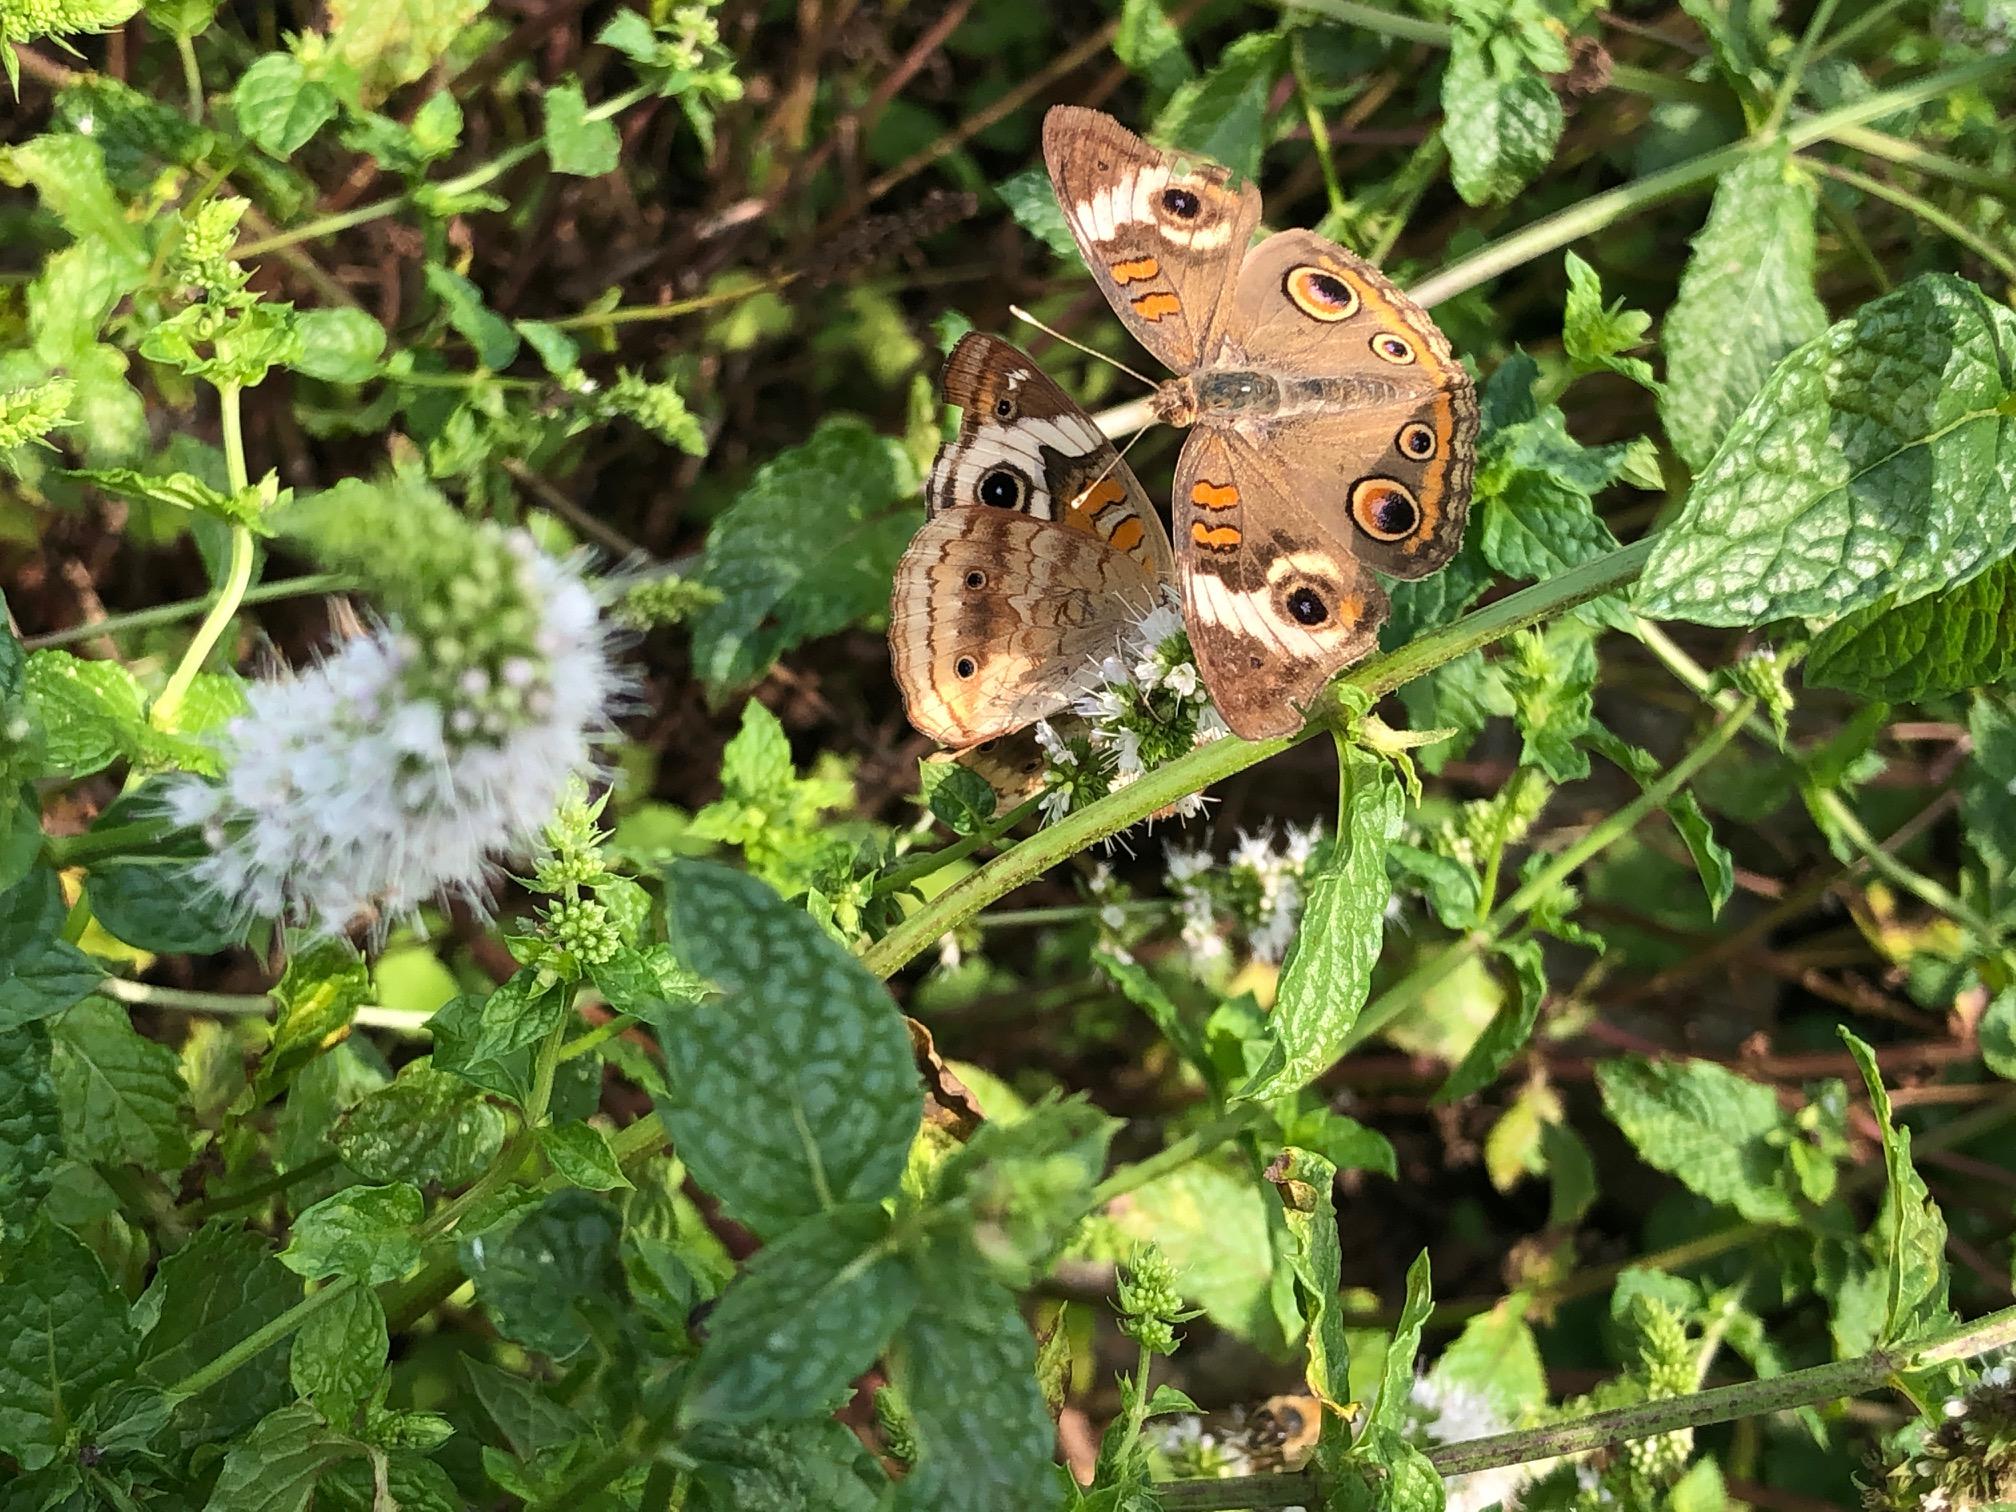 8-16 w-wildlife-chris_s butterfly.jpg